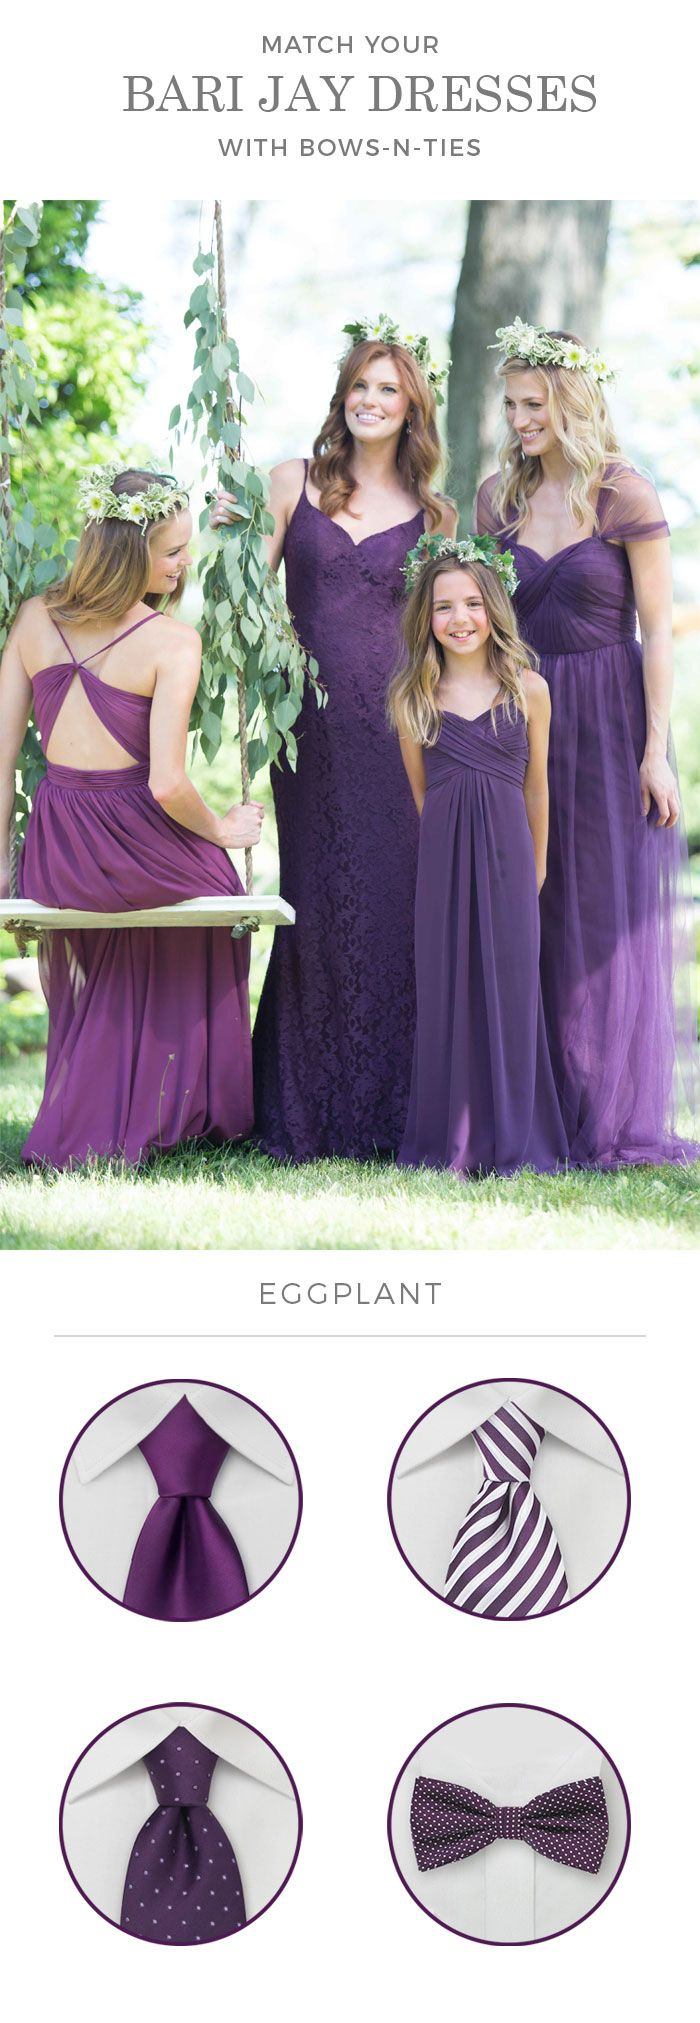 Groomsmen Accessories To Match Bari Jay Eggplant